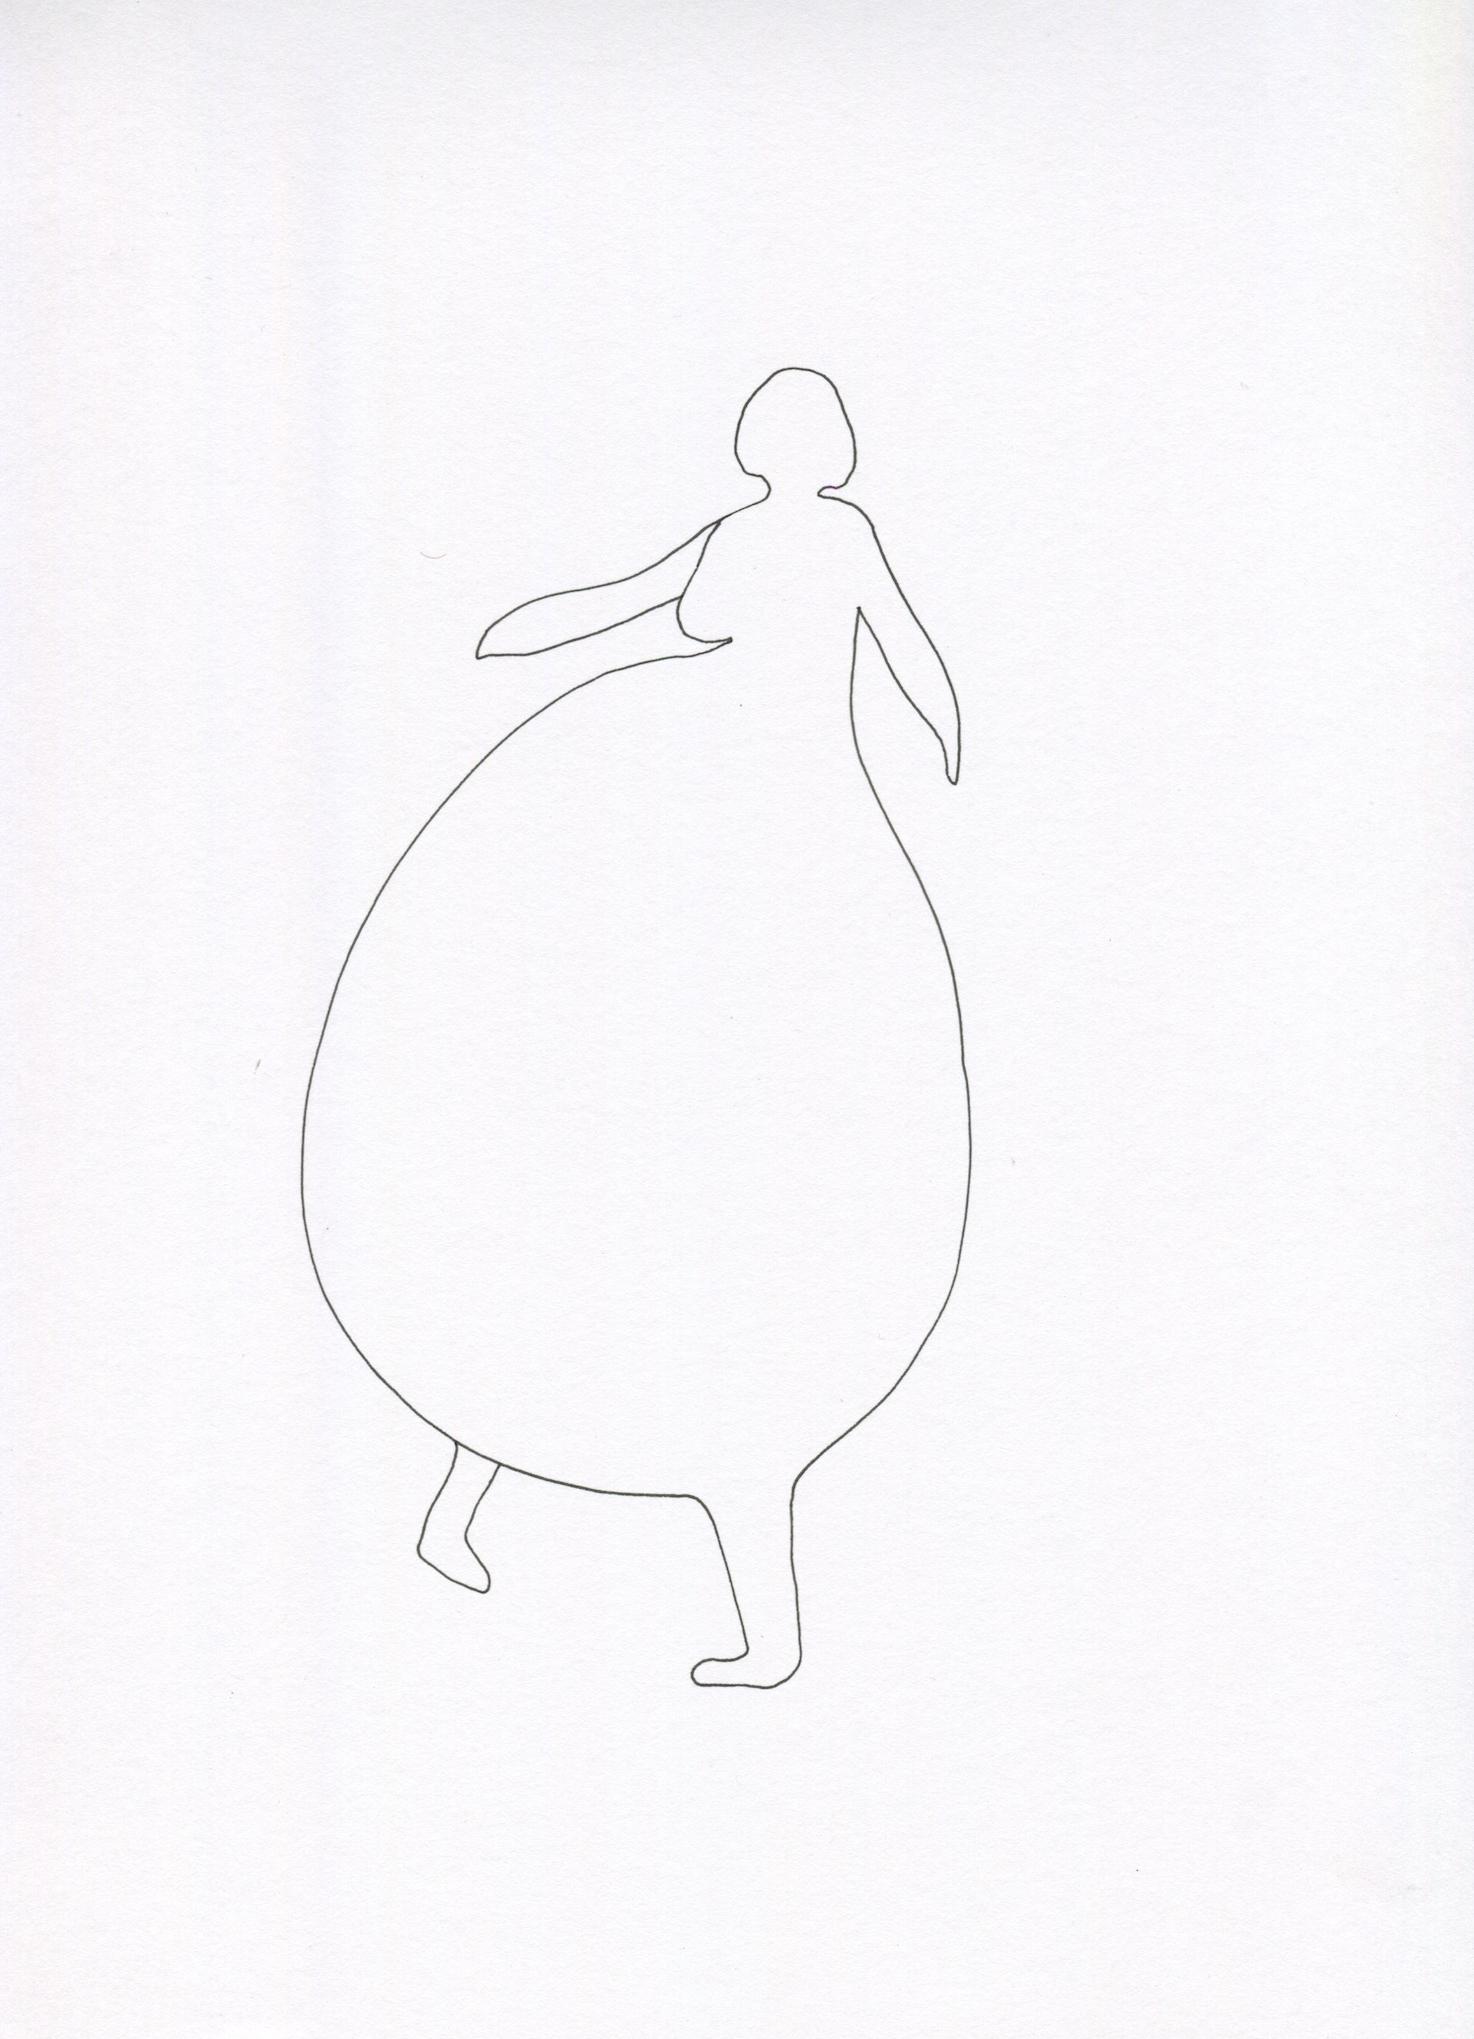 Umpa Lumpa from the Venus of Brisbane series, 2015, Ink on paper, 21.0 x 30.0 cm